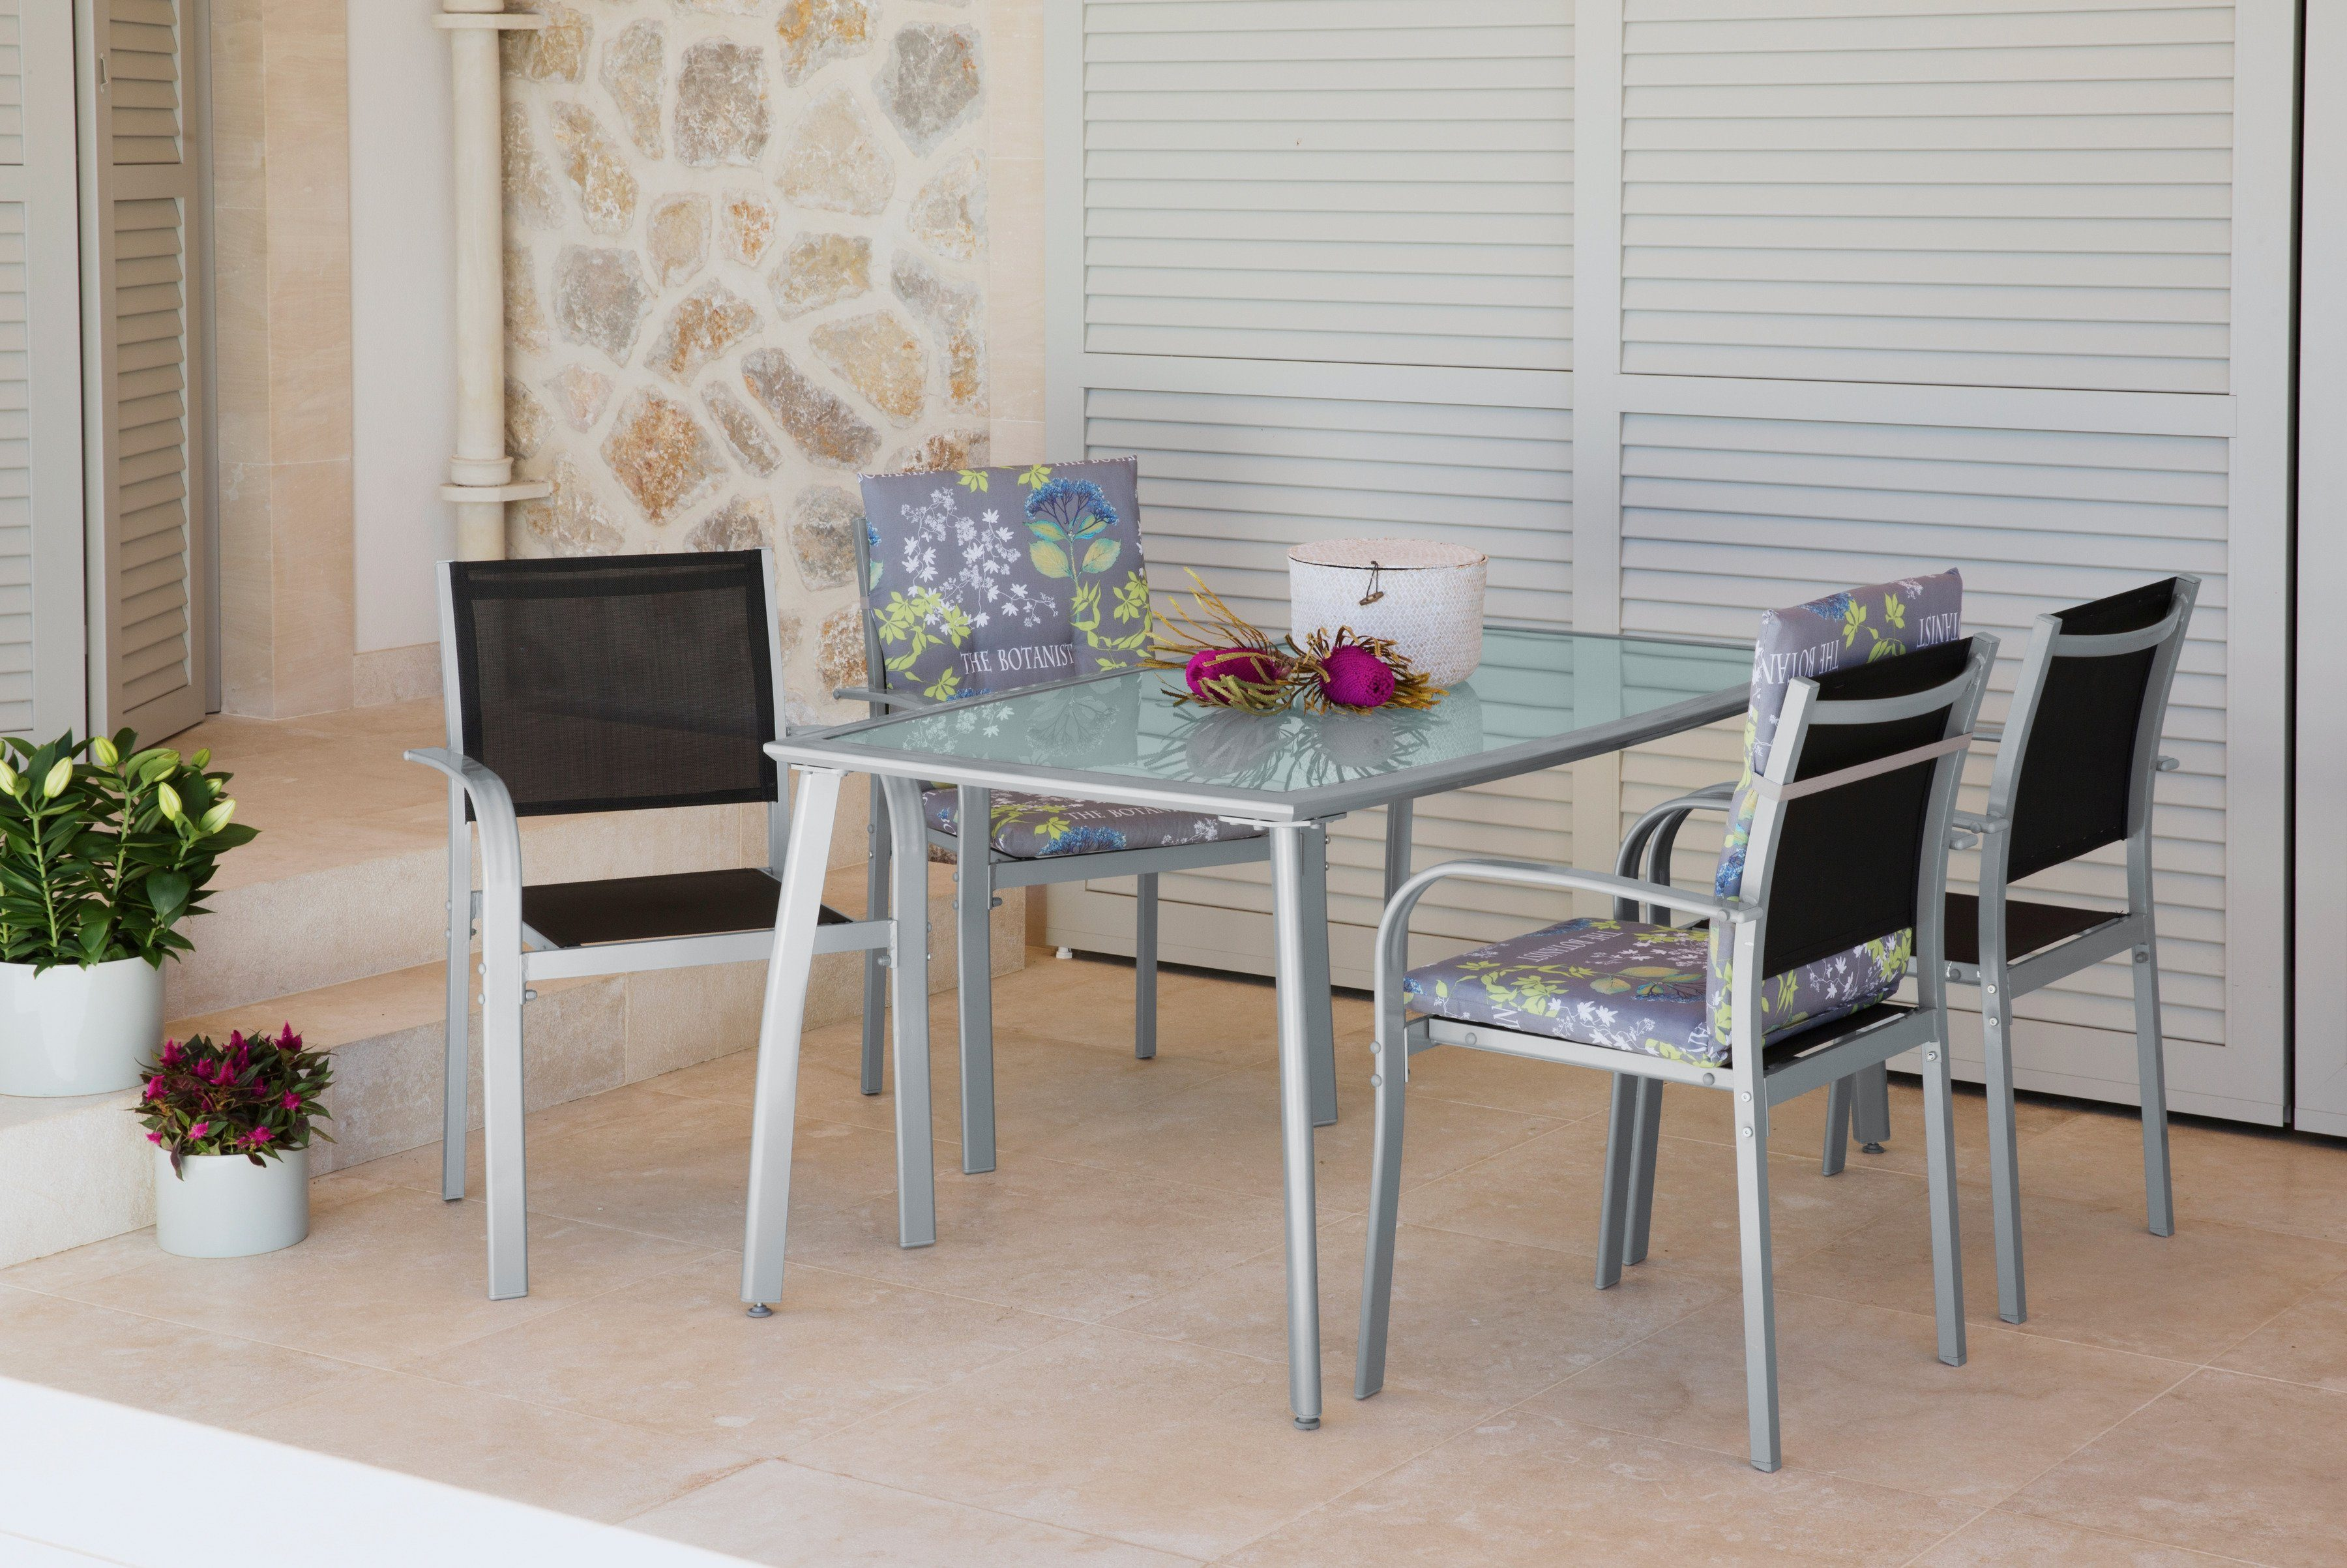 5-tlg. Gartenmöbelset »Lima«, 4 Stapelsessel, Tisch 150x90 cm, Alu/Textil, schwarz